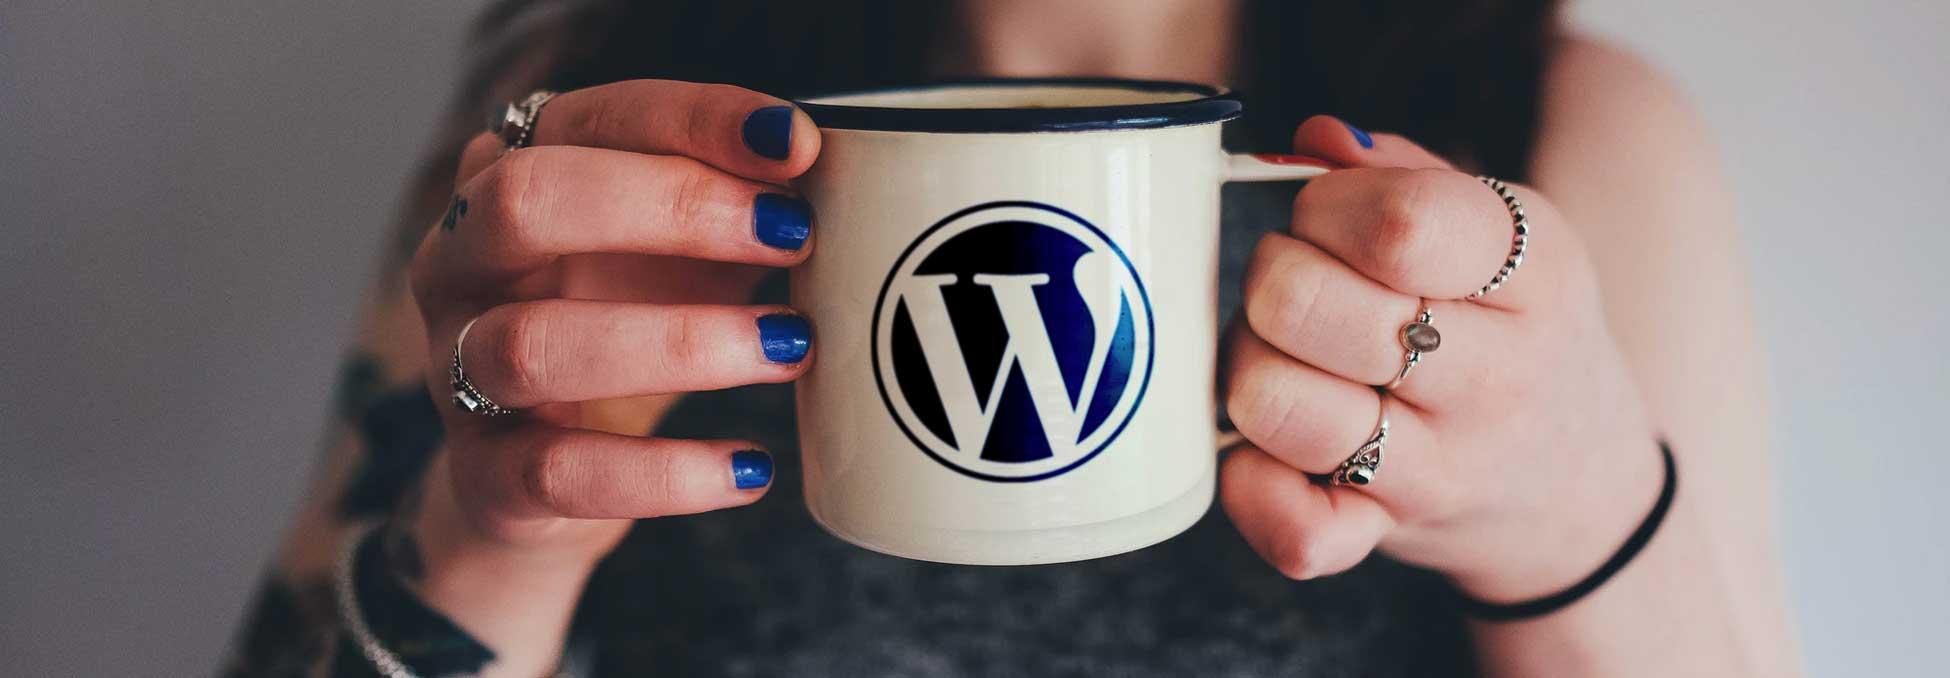 Top WordPress Questions